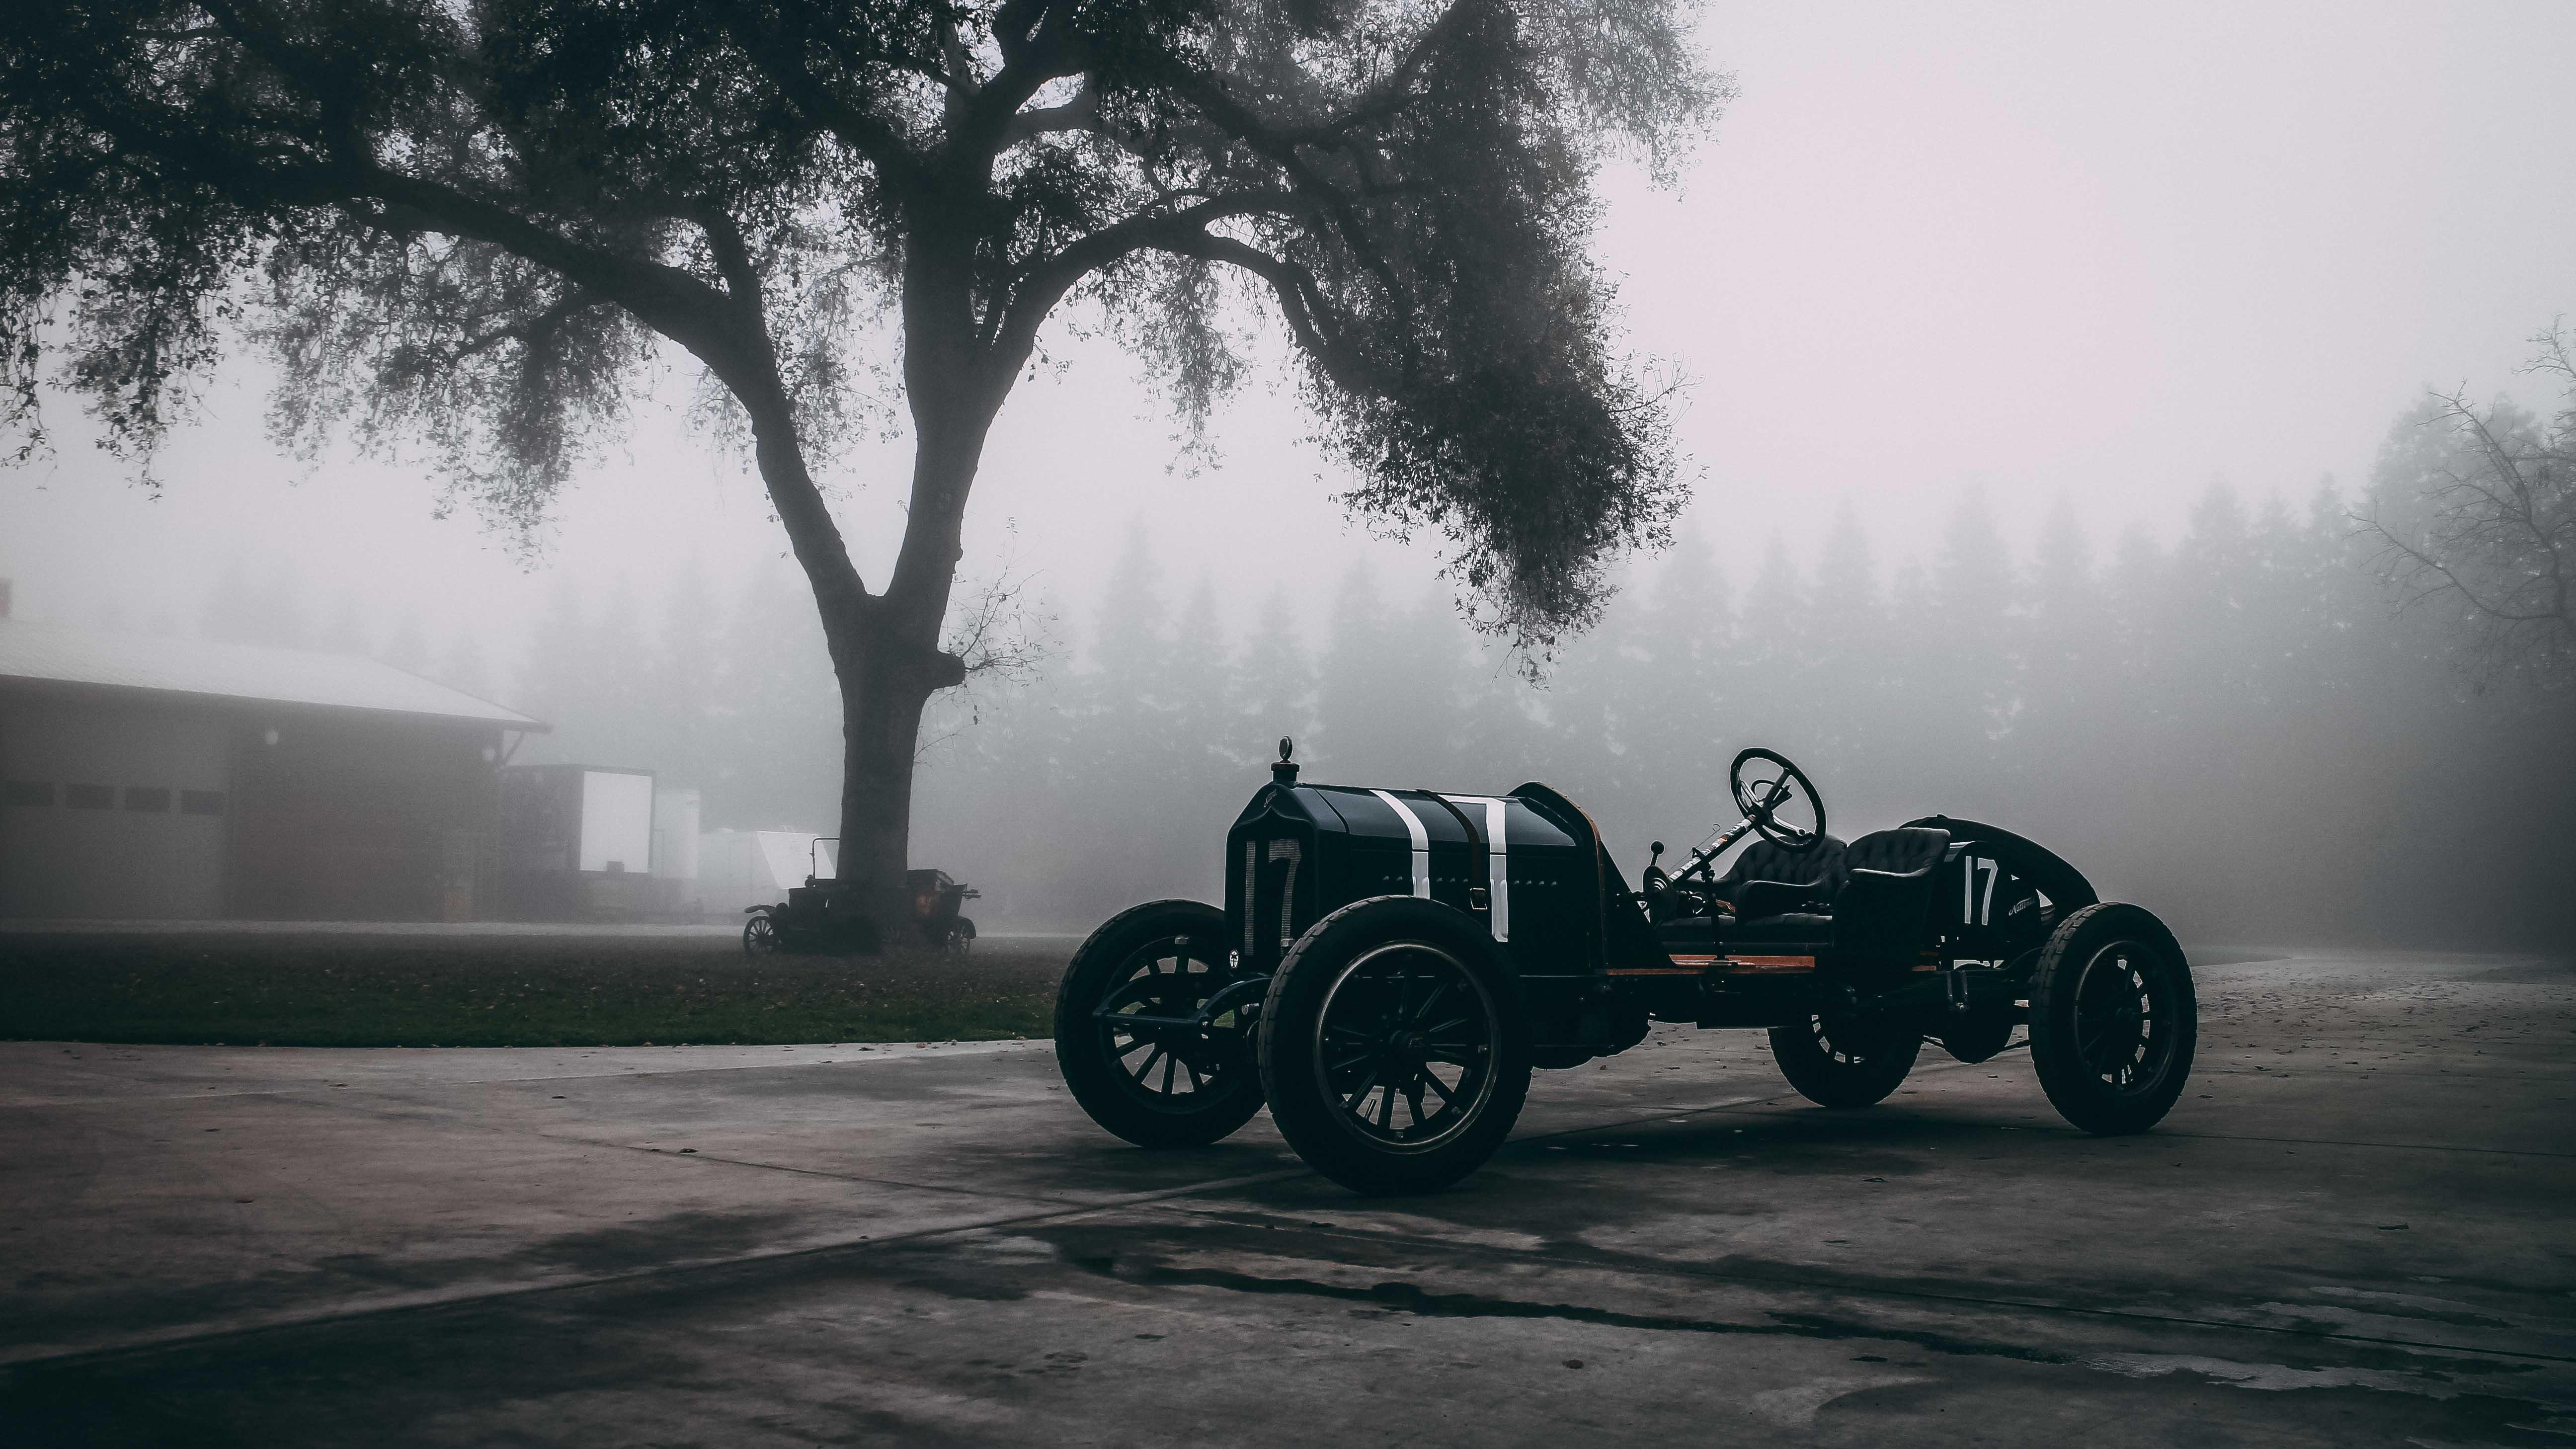 vintage race car in the fog